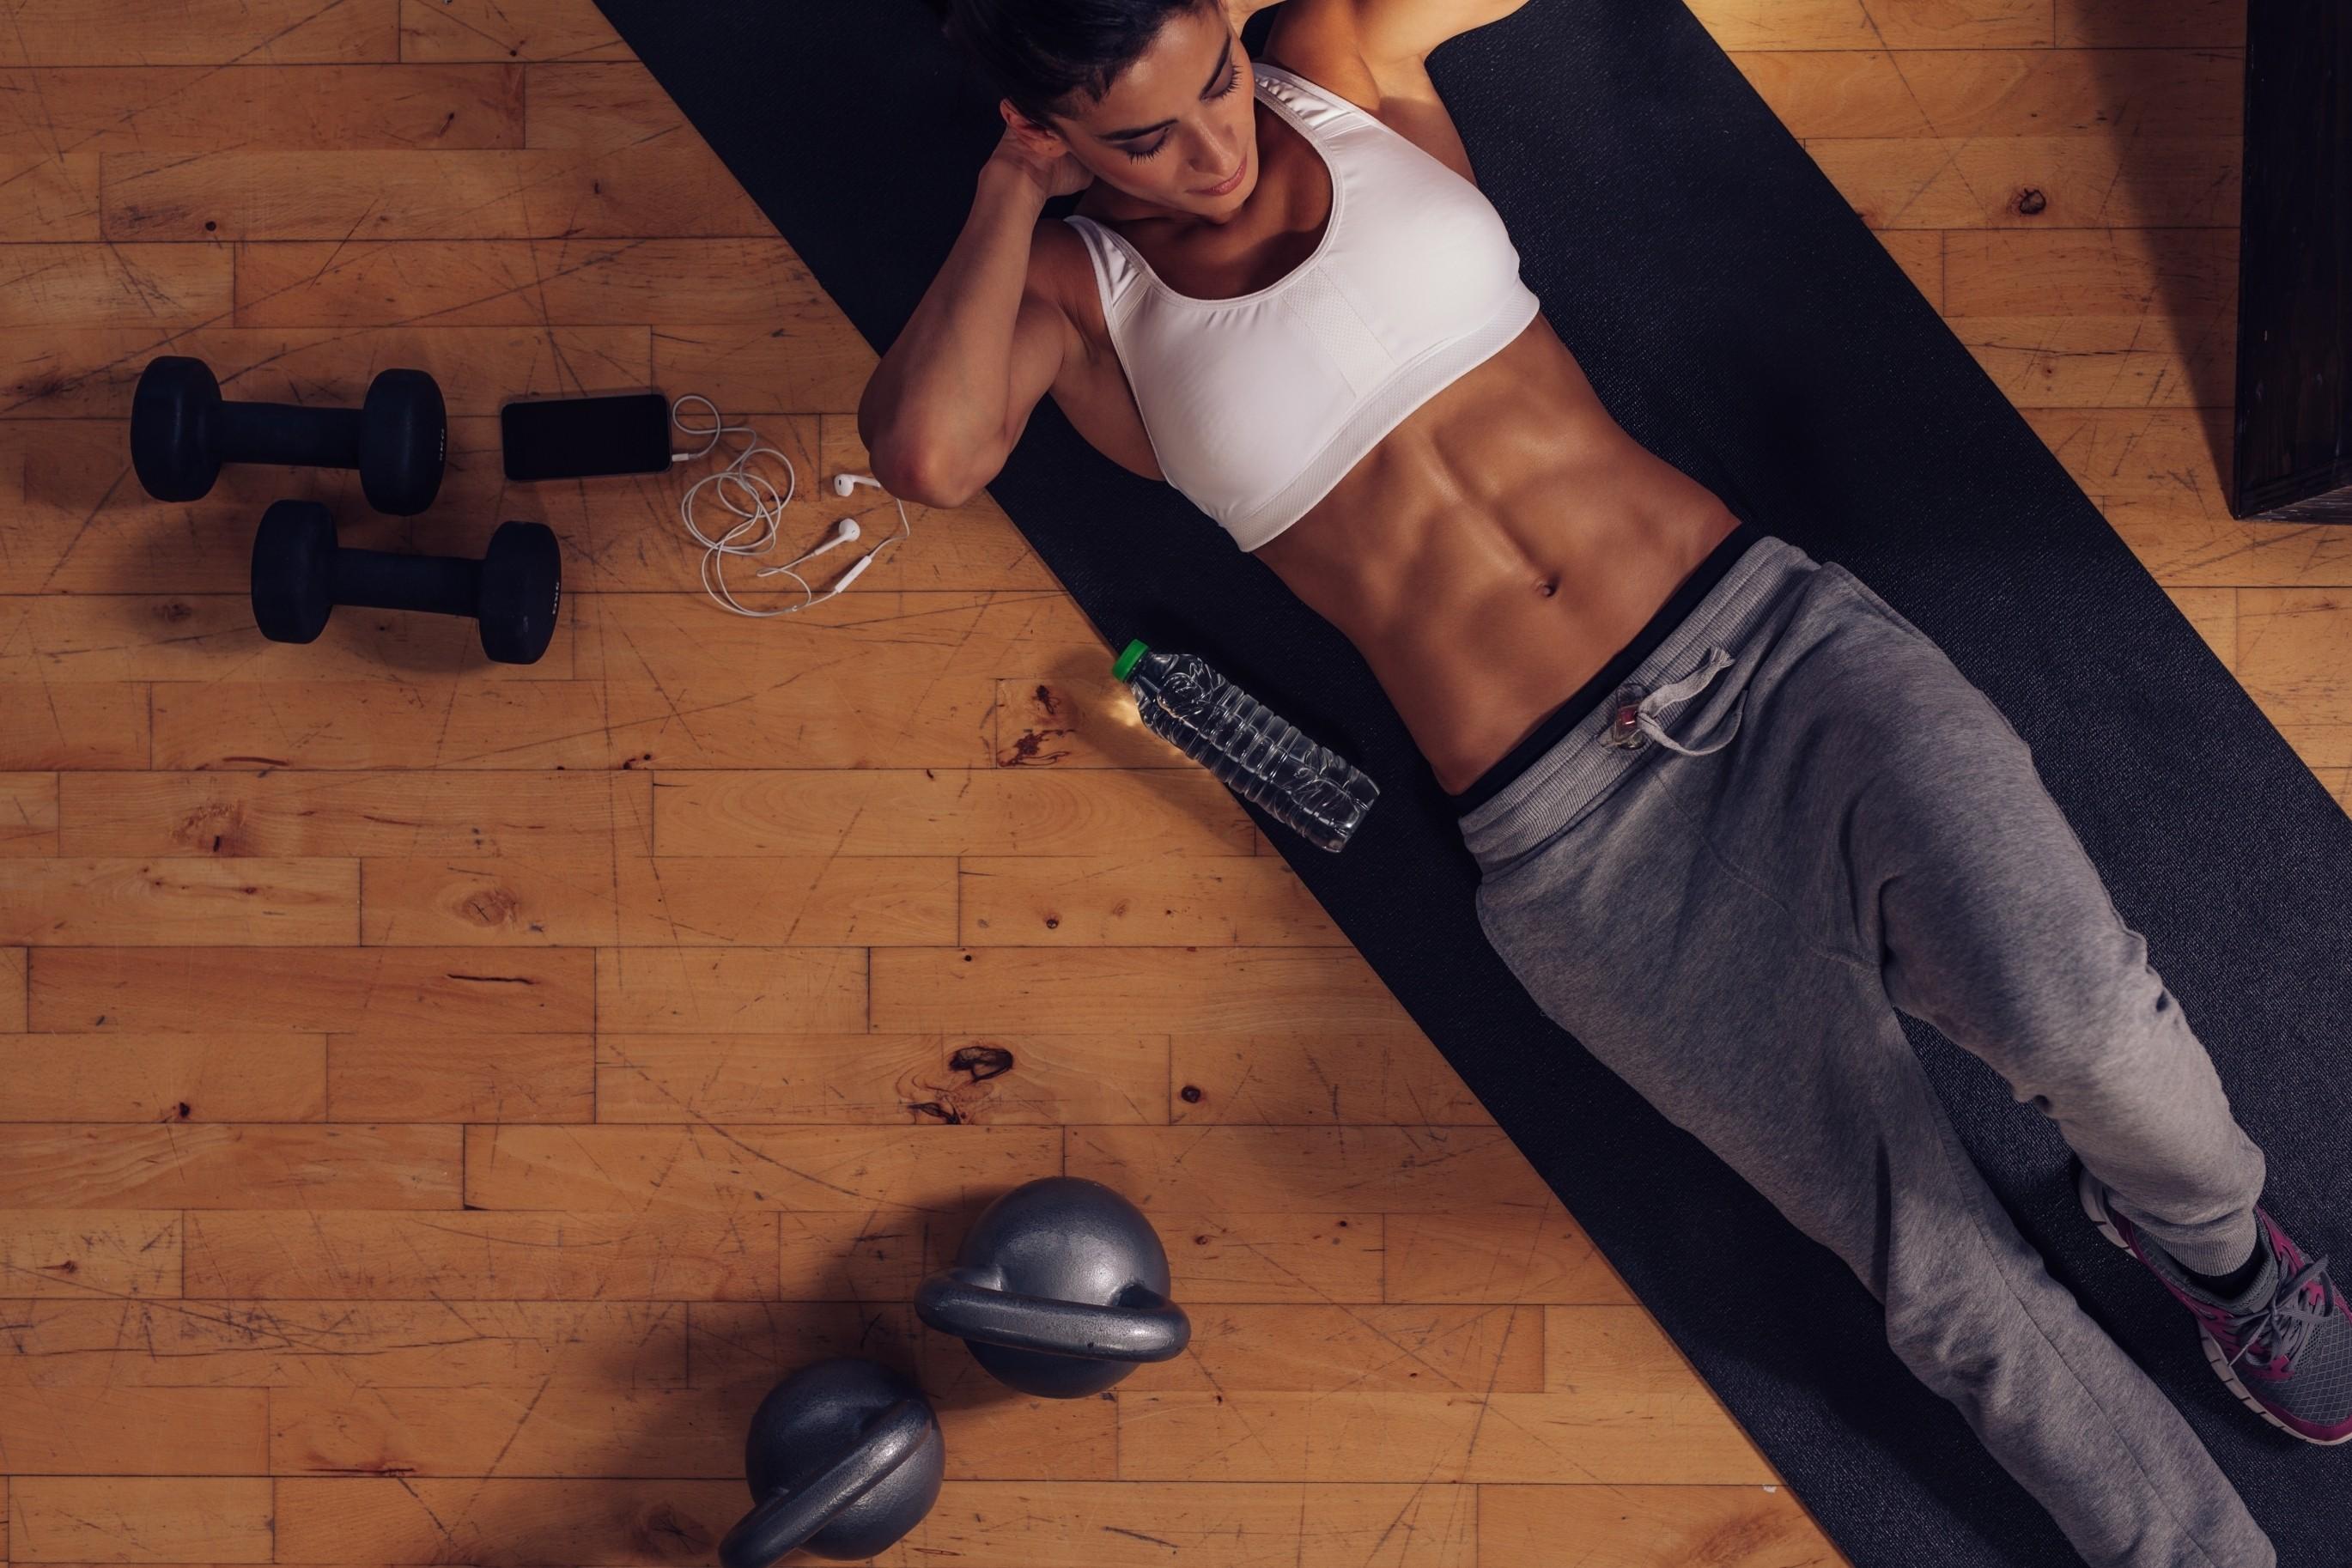 Women Model Sweat Pants Abs Sweatpants 2739x1826